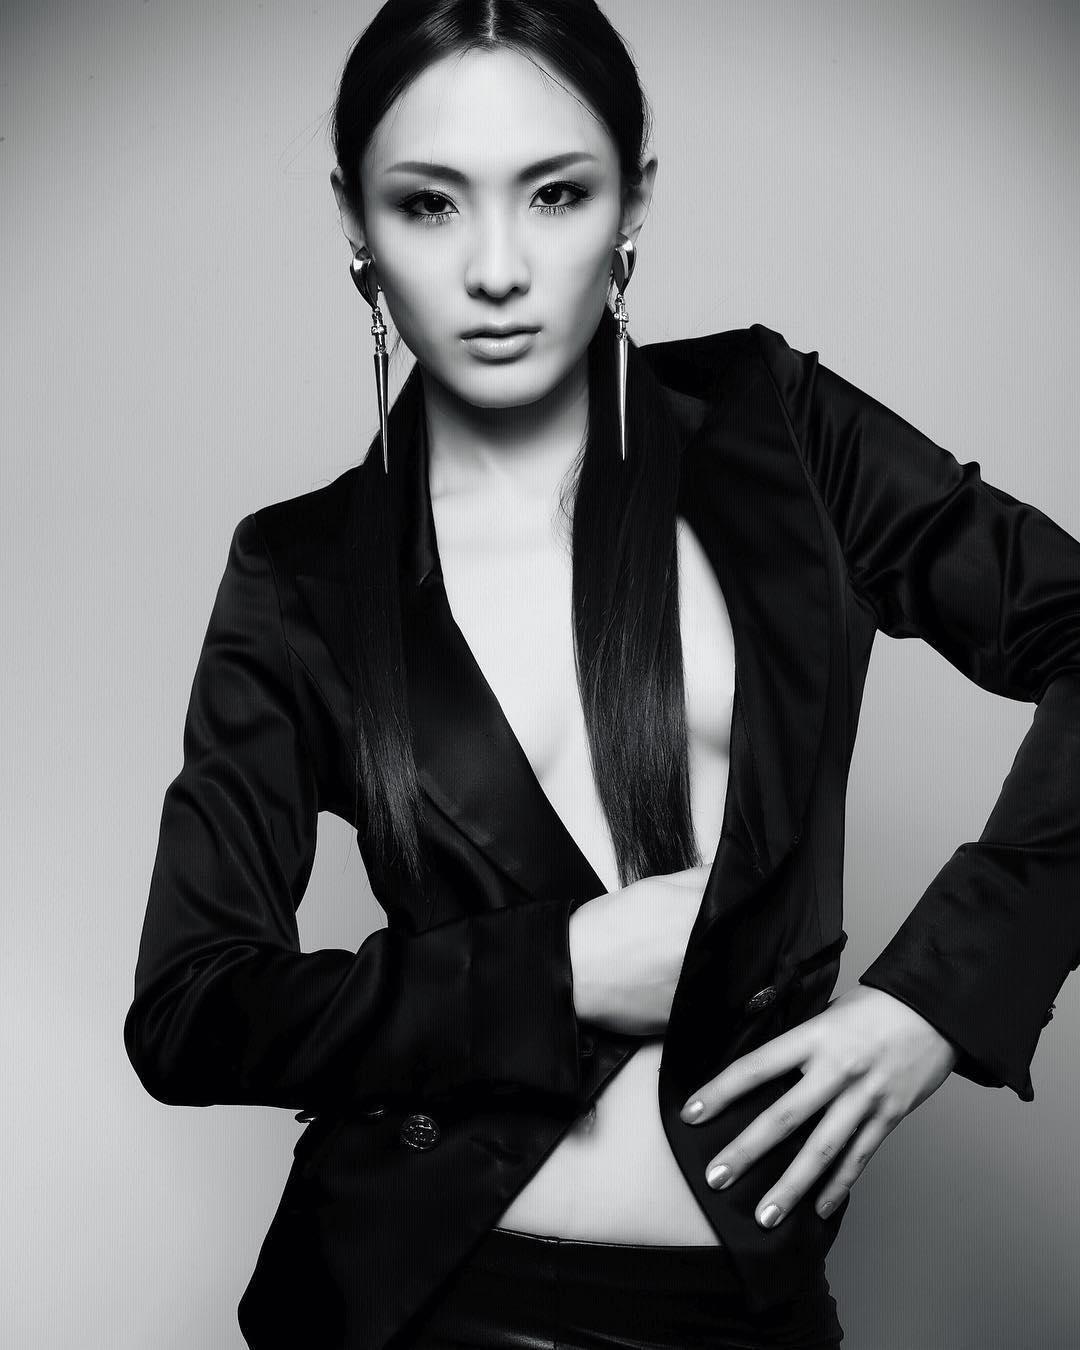 nữ dj xinh đẹp - hiloco mặc suit đen